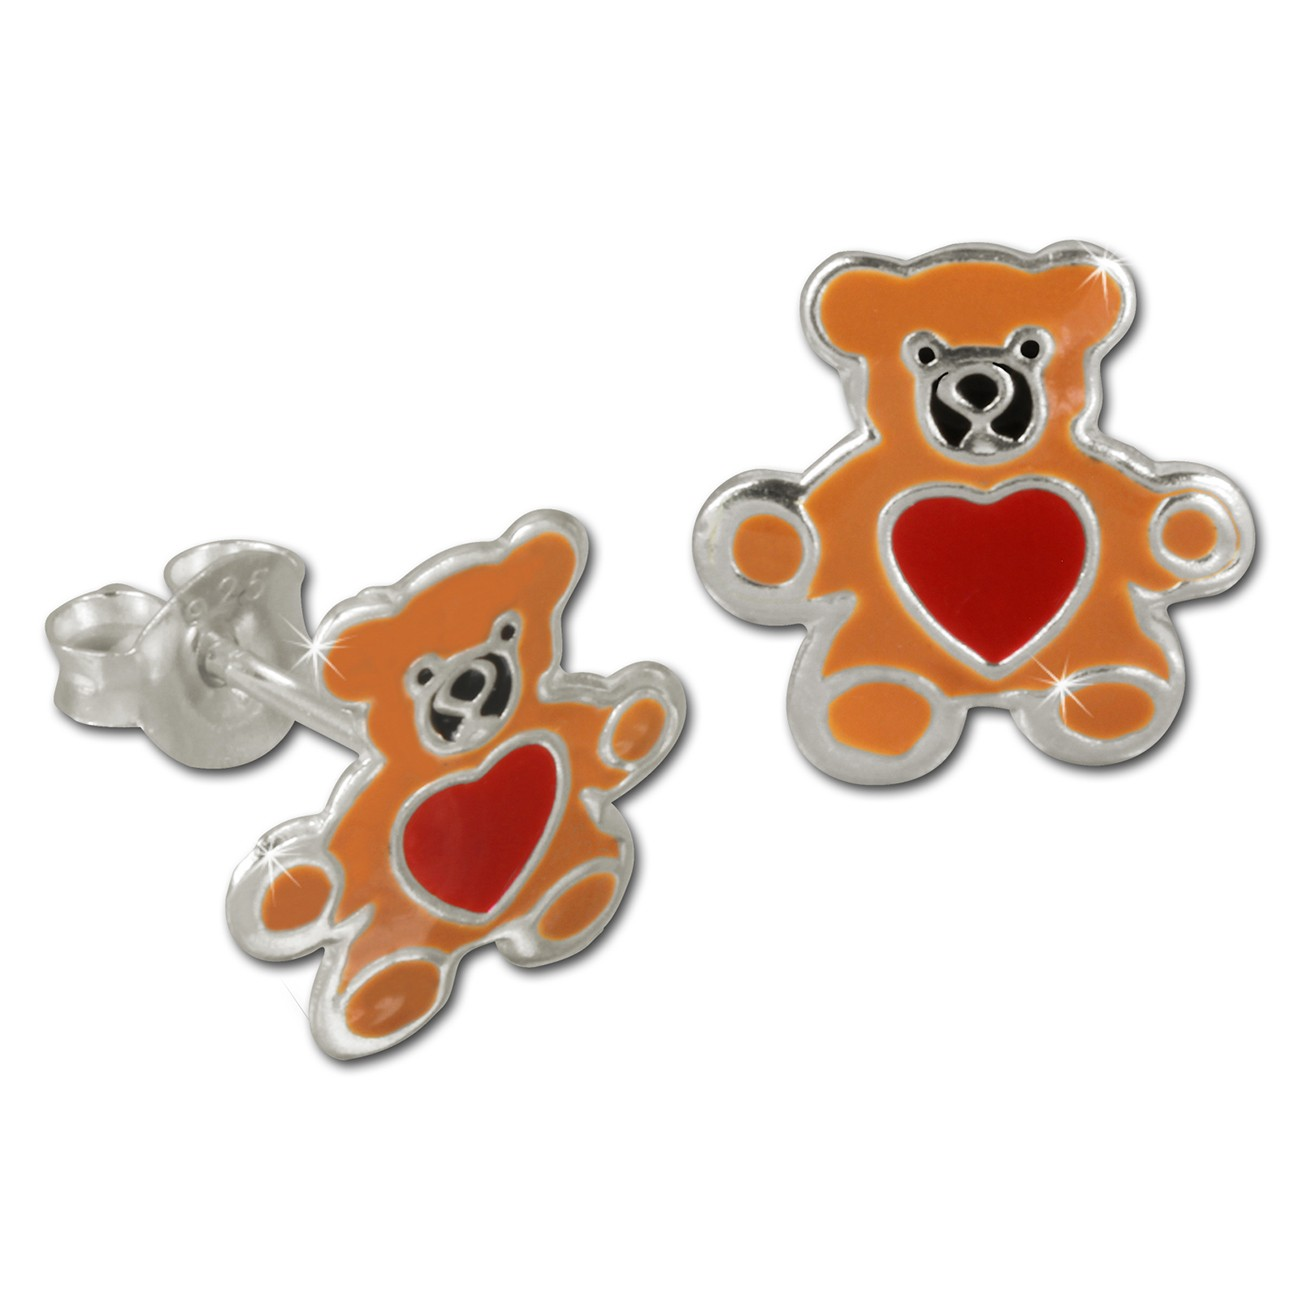 Kinder Ohrring Teddy braun Silber Ohrstecker Kinderschmuck TW SDO8104N